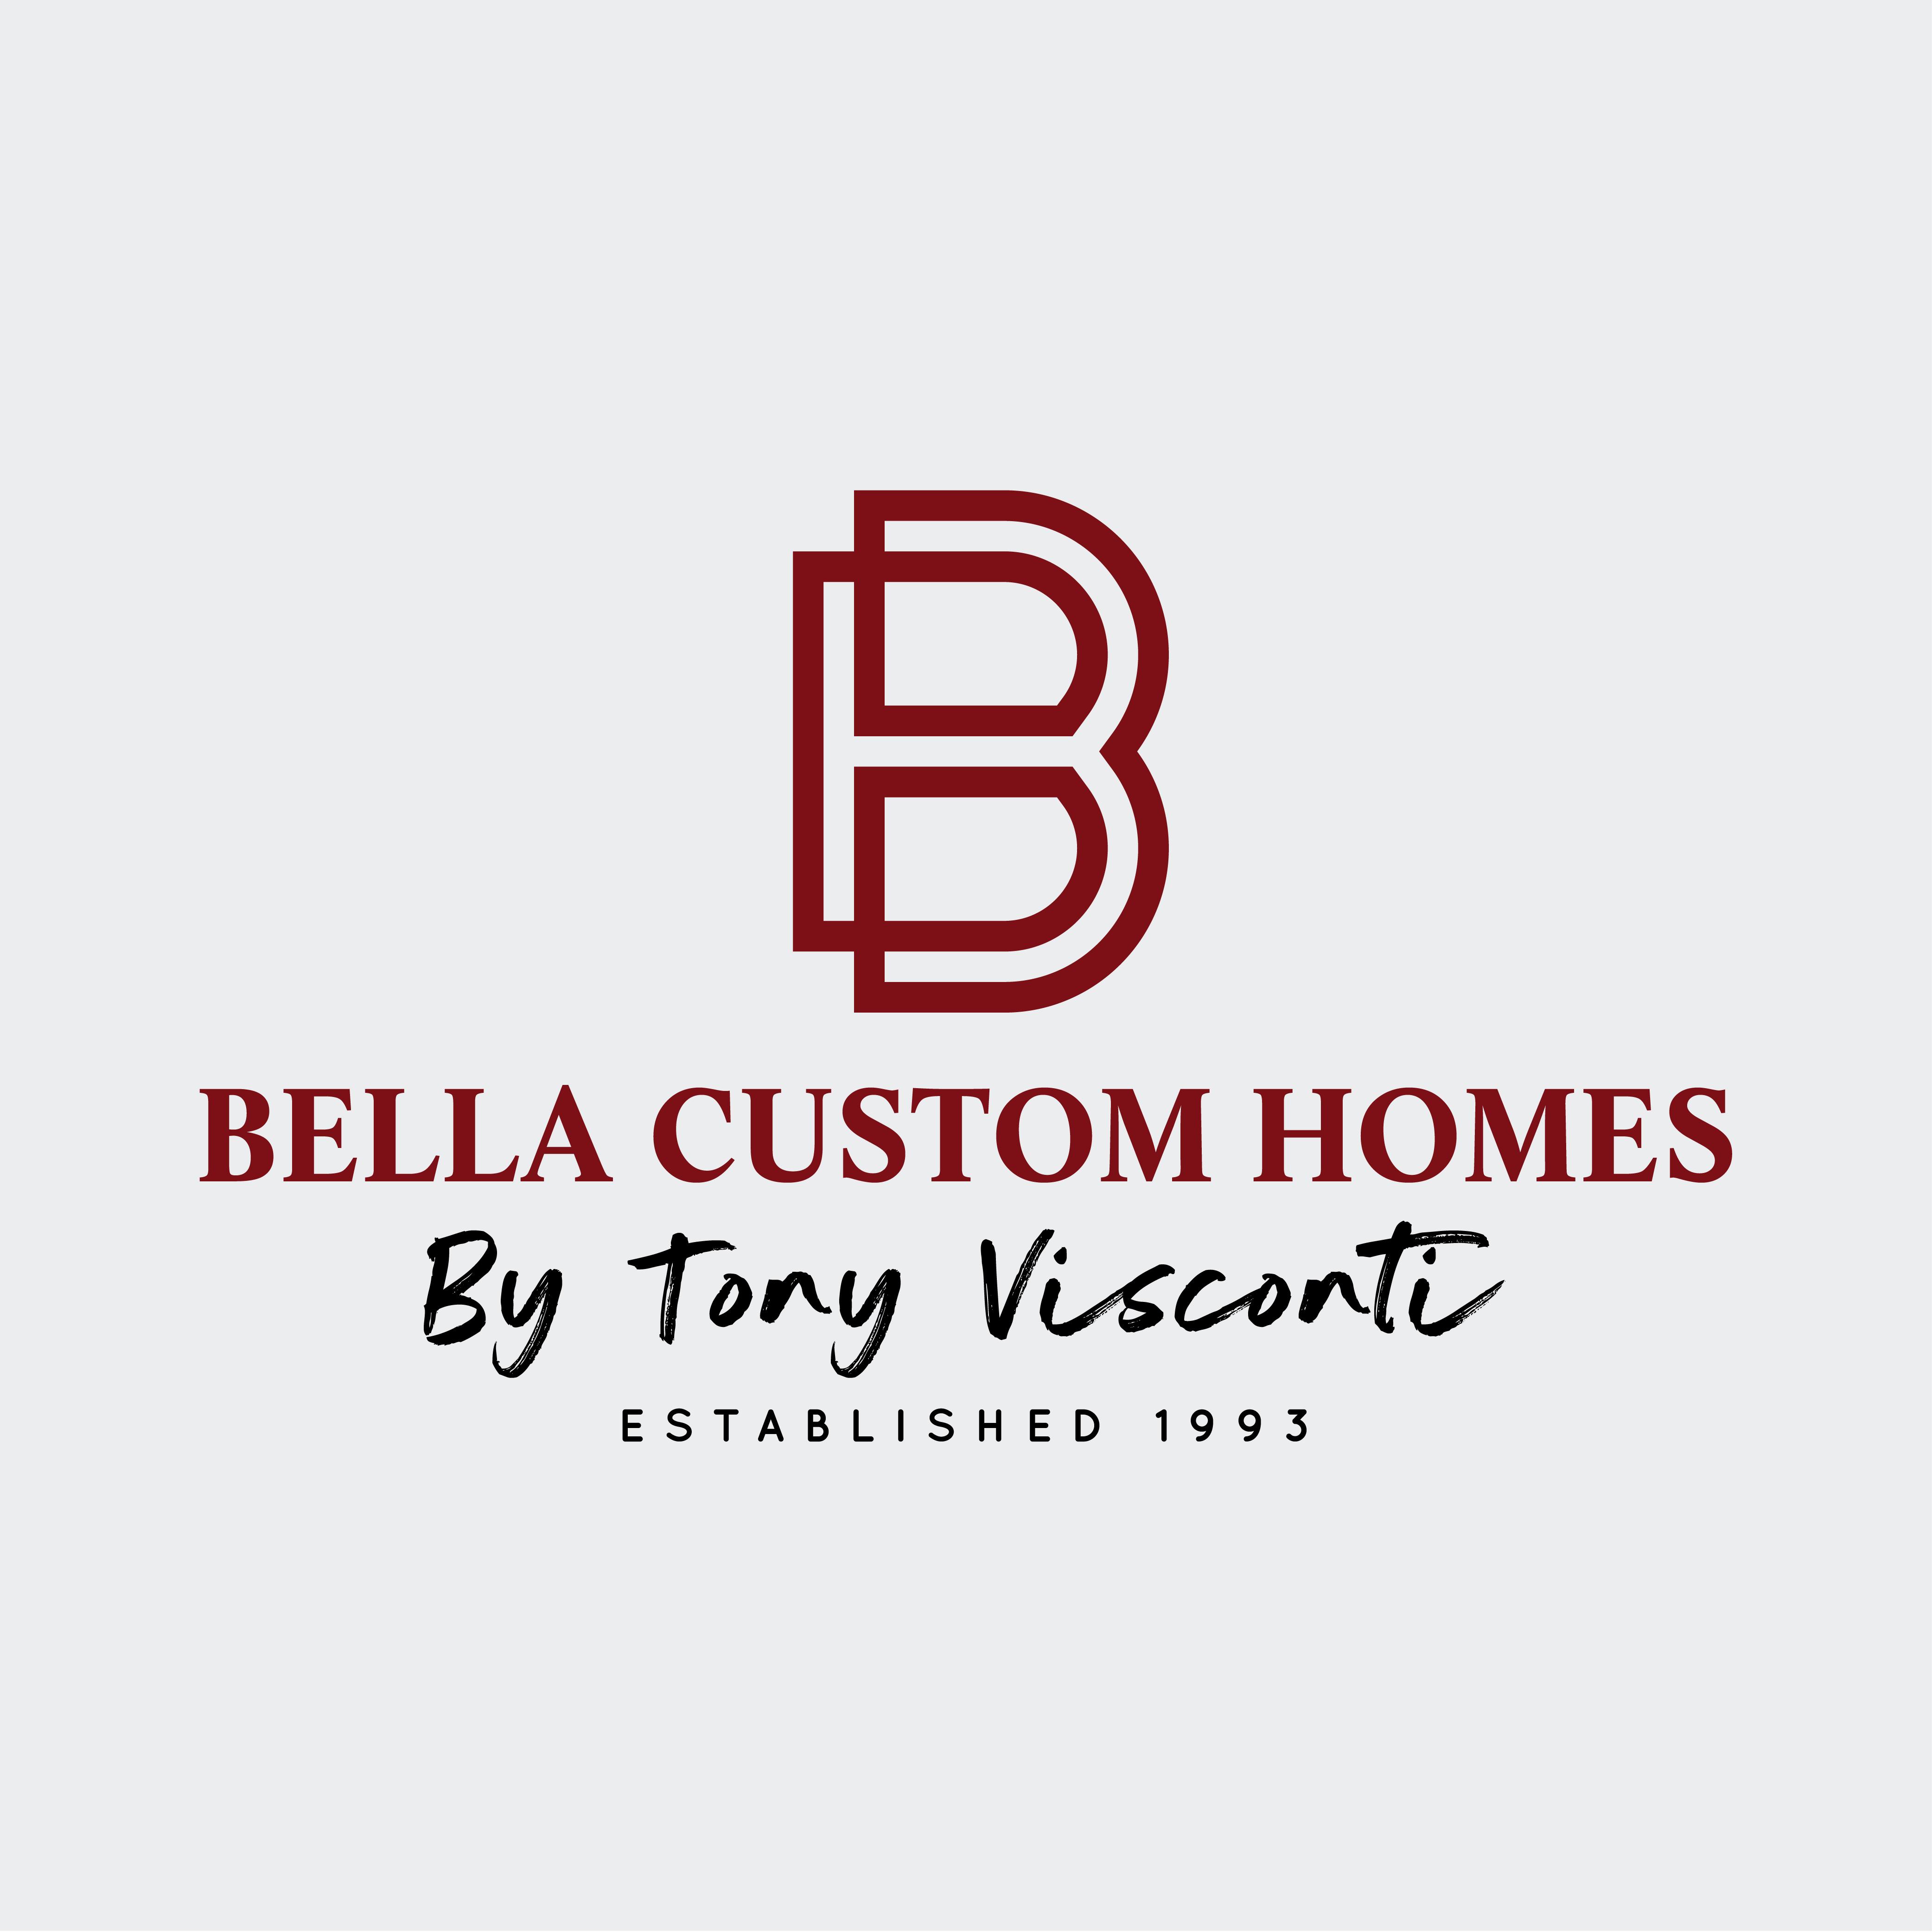 Bella Custom Homes